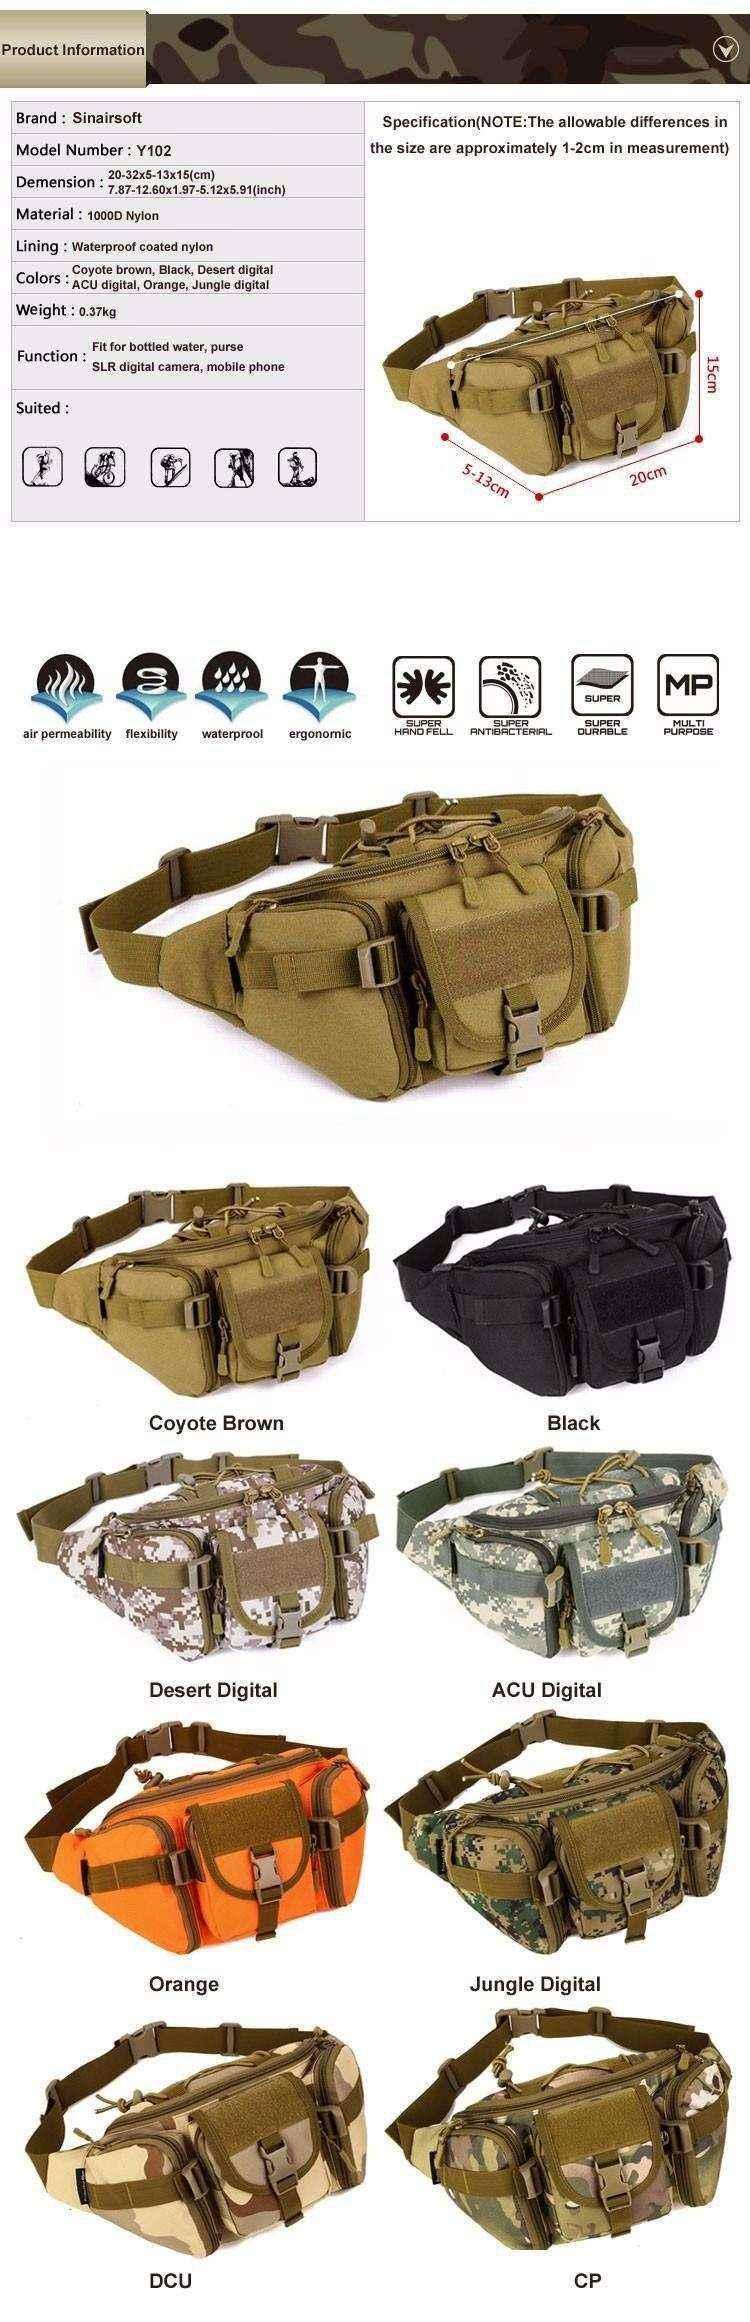 Compre Sinairsoft Tactical Molle Bolsa Impermeable Bolsa De Riñonera ...